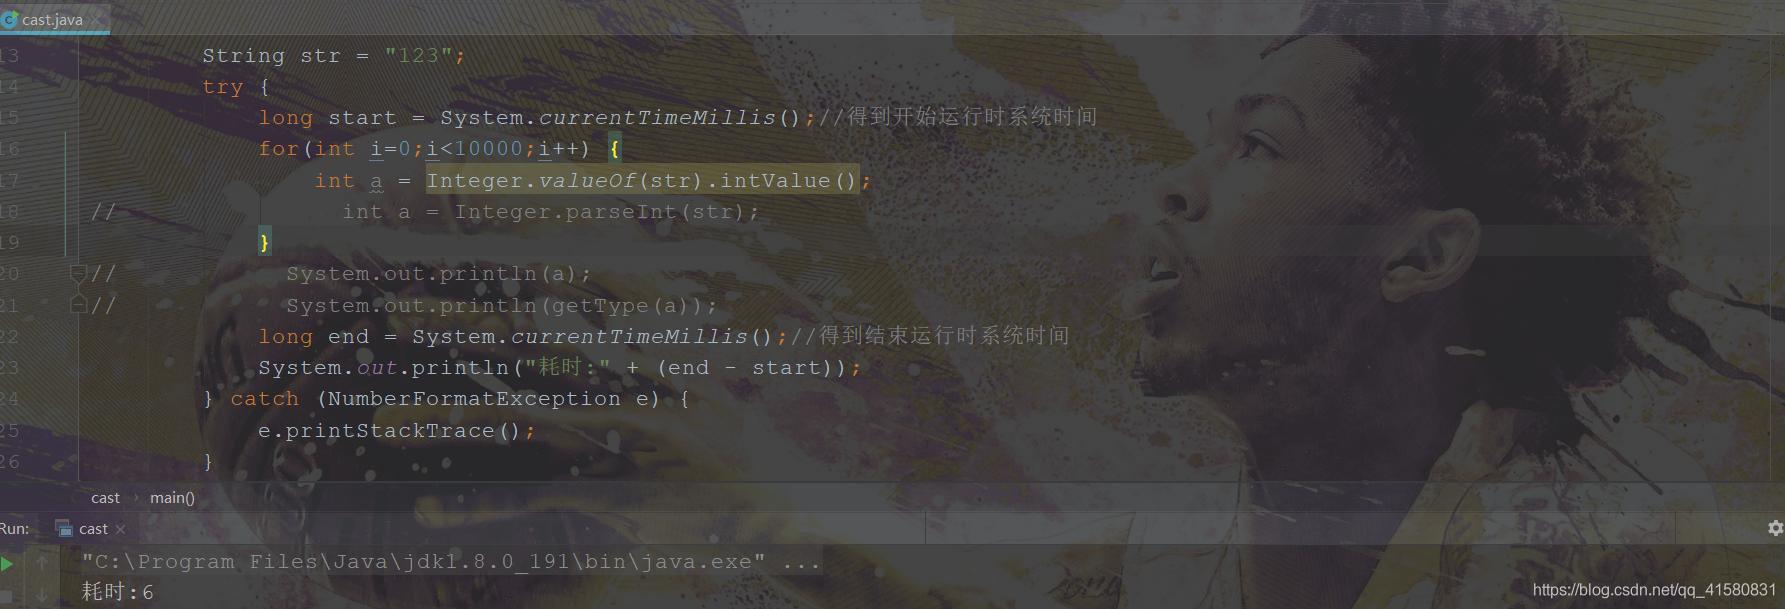 ](https://img-blog.csdnimg.cn/20200116150216320.png?x-oss-process=image/watermark,type_ZmFuZ3poZW5naGVpdGk,shadow_10,text_aHR0cHM6Ly9ibG9nLmNzZG4ubmV0L3FxXzQxNTgwODMx,size_16,color_FFFFFF,t_70)